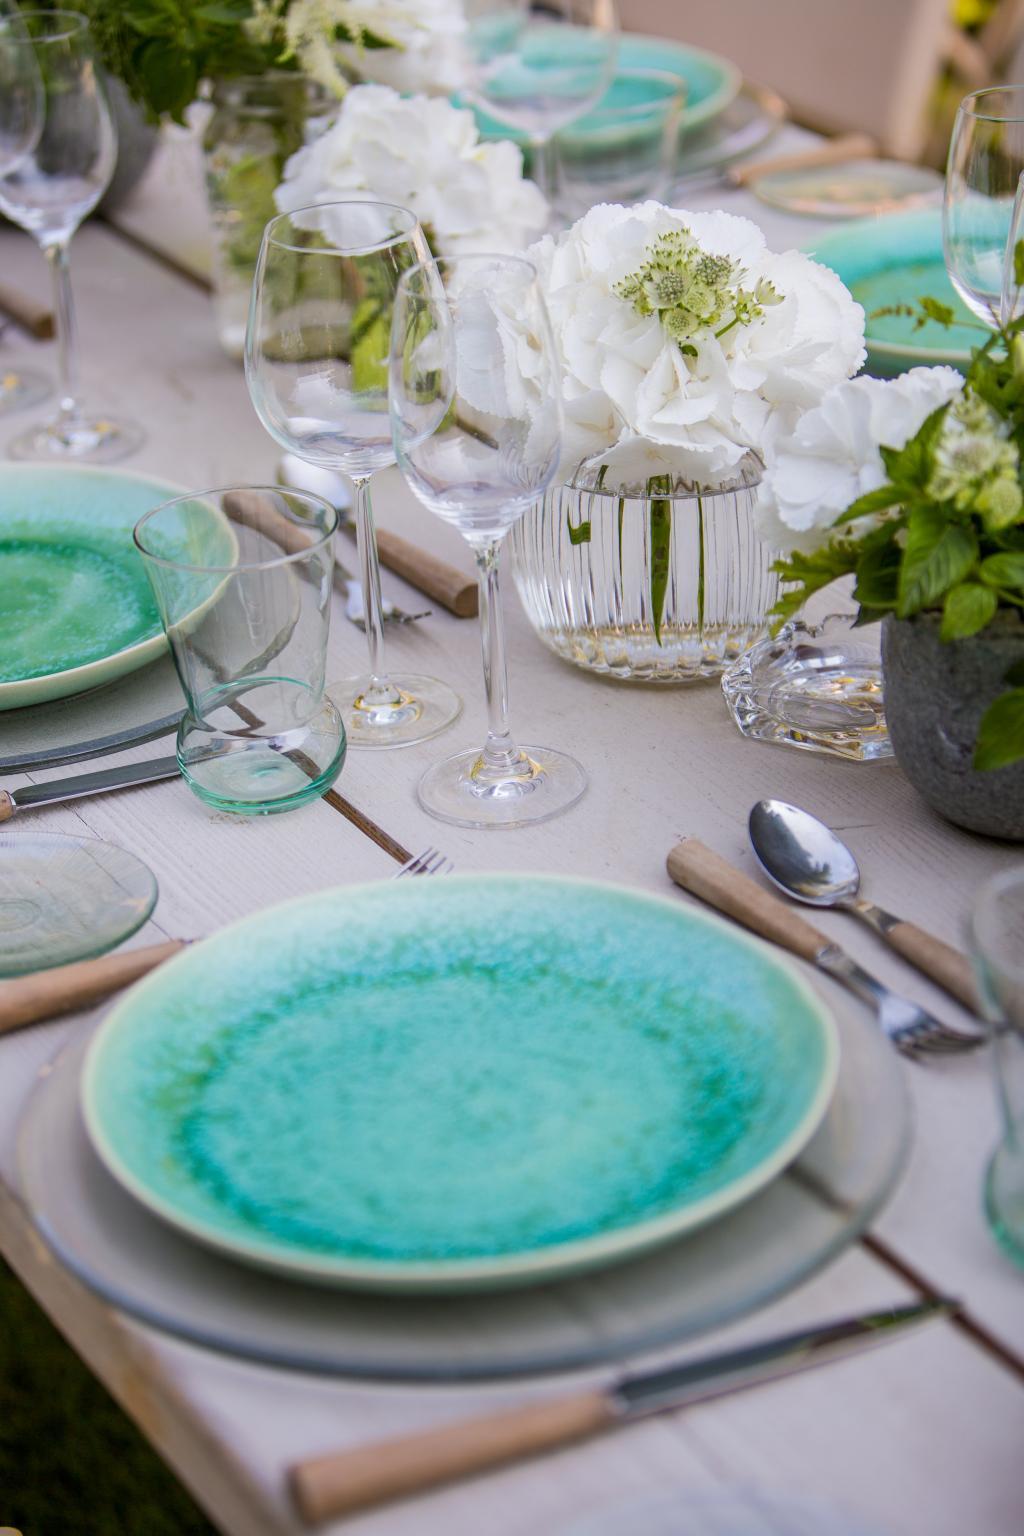 P&N Sinterina wedding - Image 14